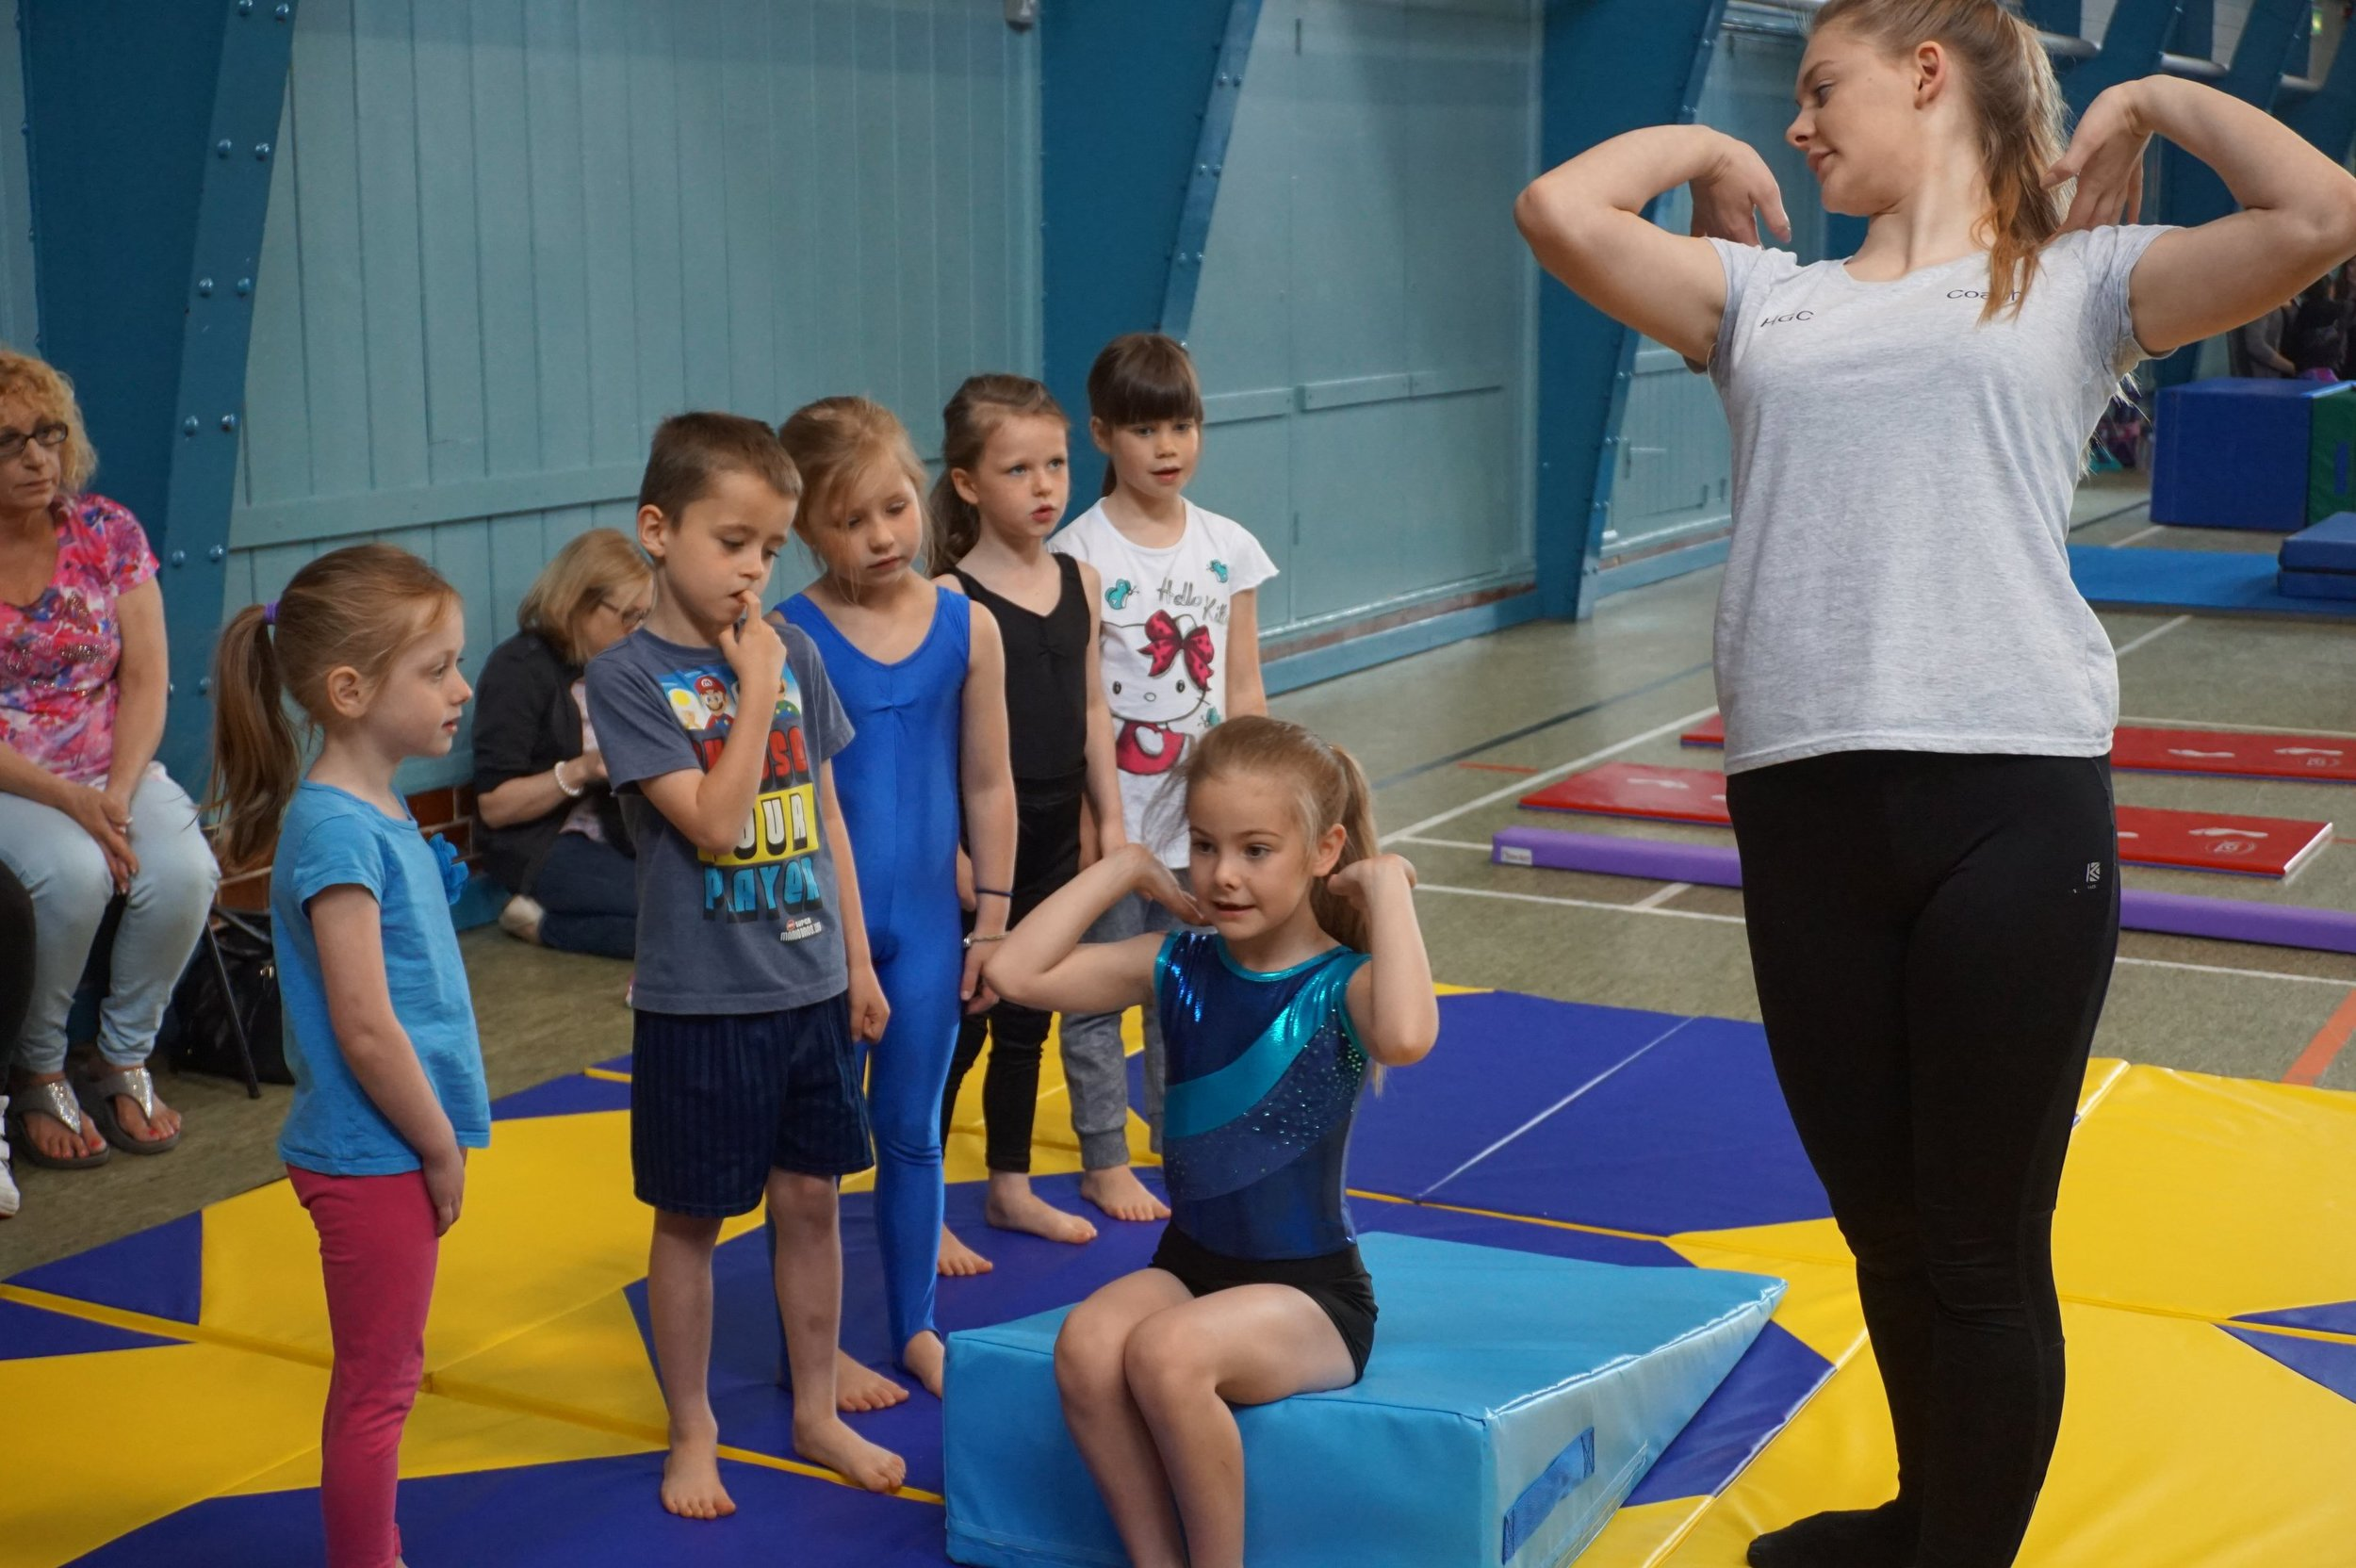 herts-gymnastics-club-pic.JPG